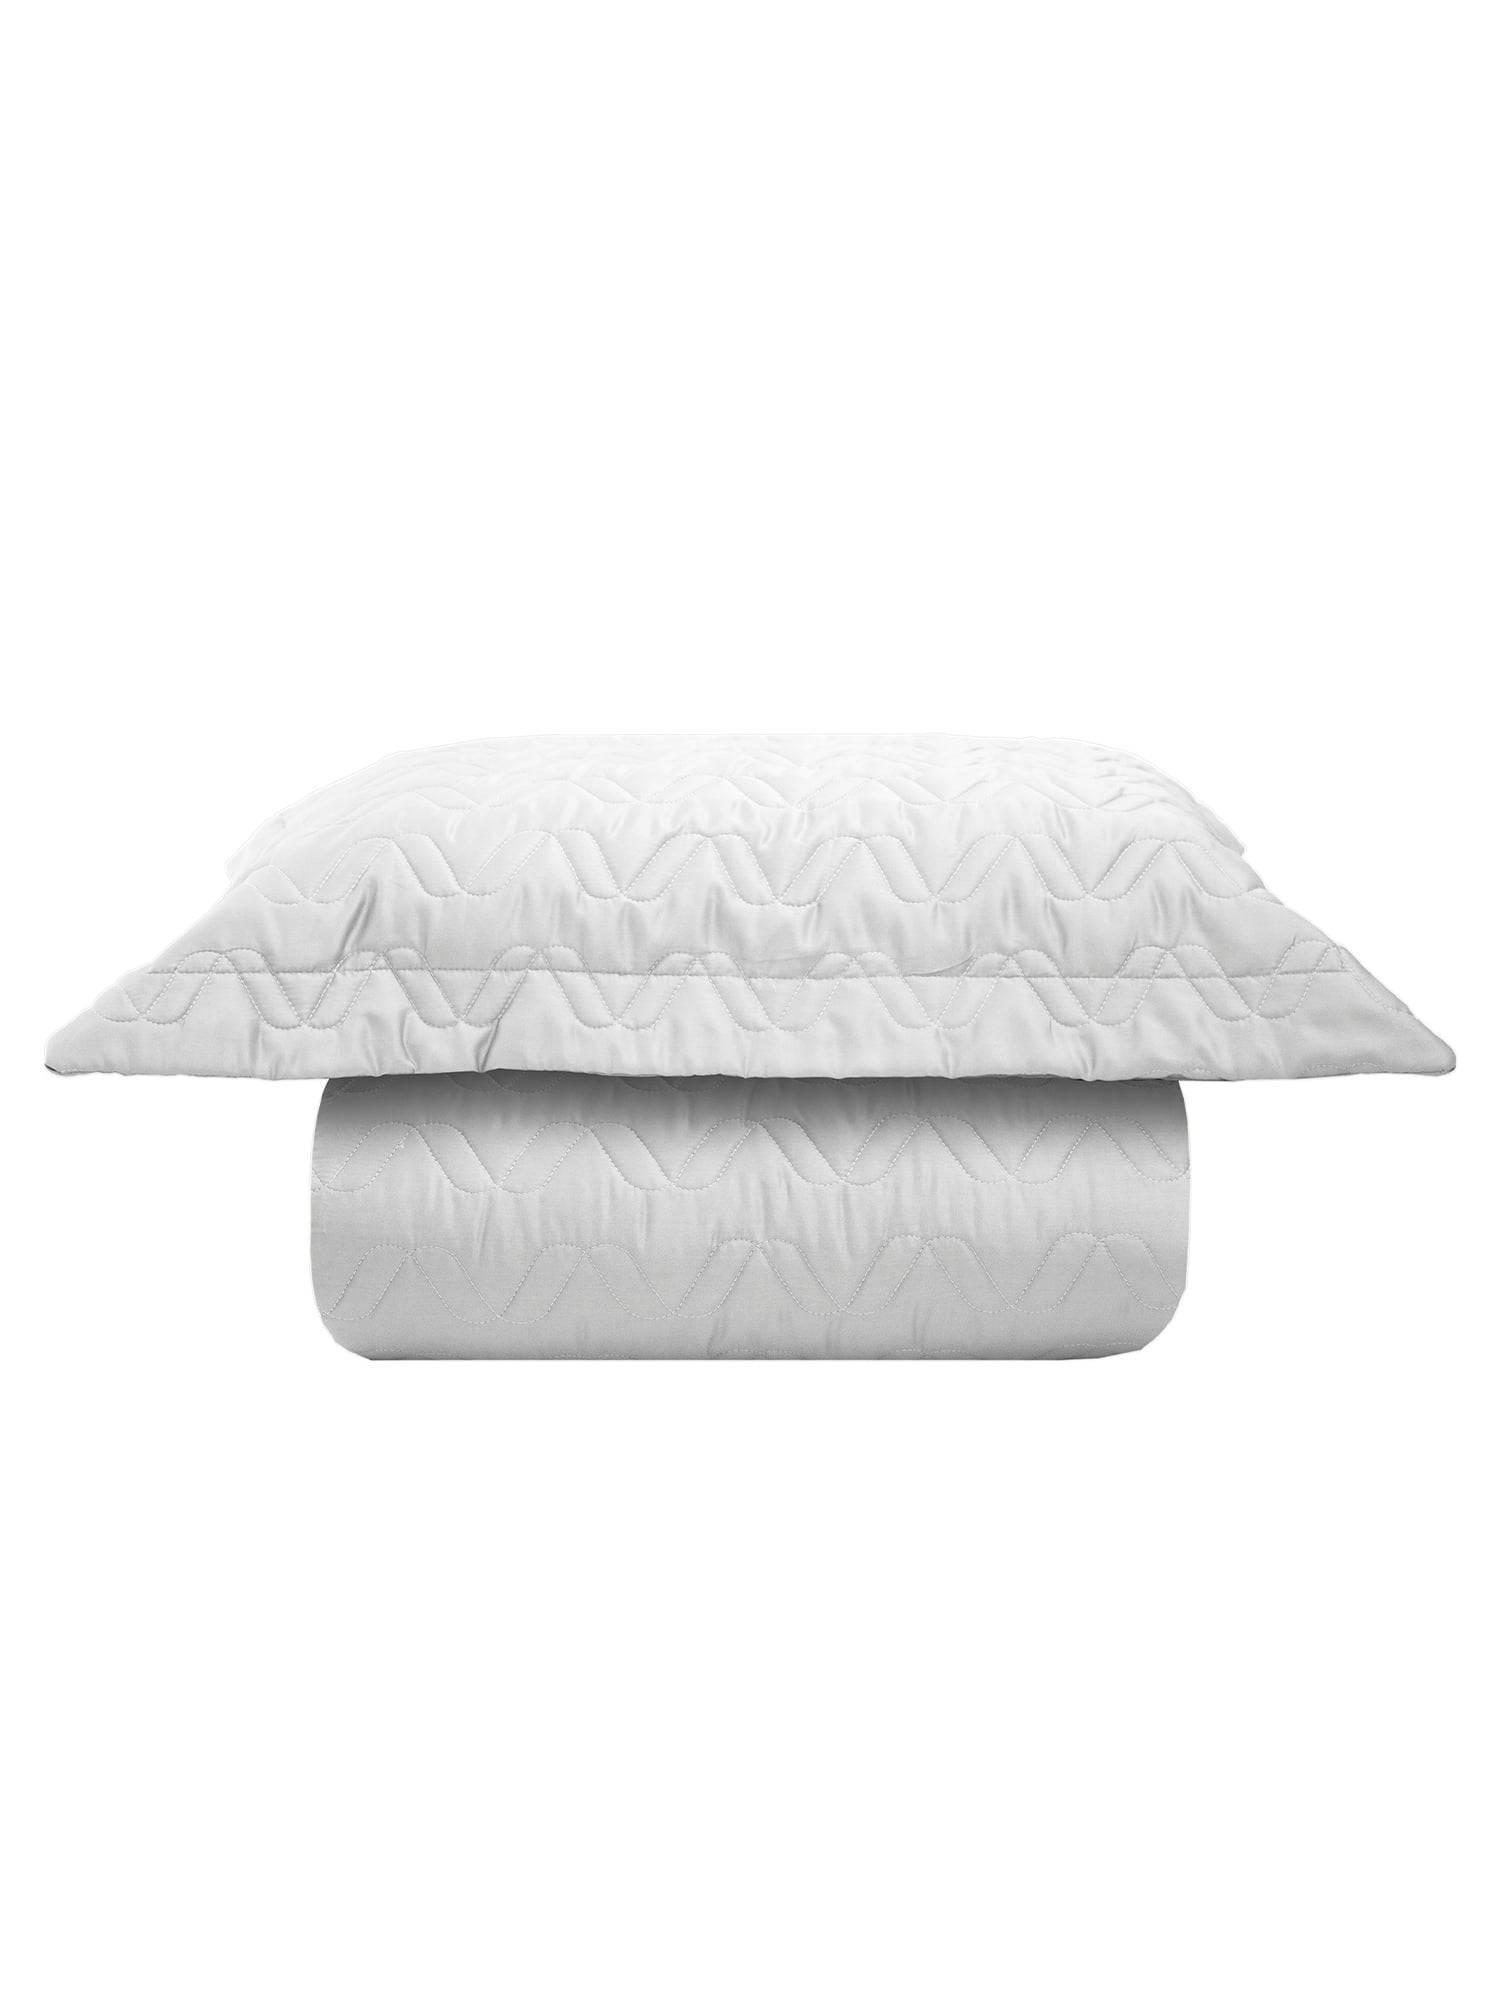 Kit 3 Peças Cobre leito Queen 300 Fios Acetinado Liso Branco + 2 Porta Travesseiros - Satinee Kacyumara